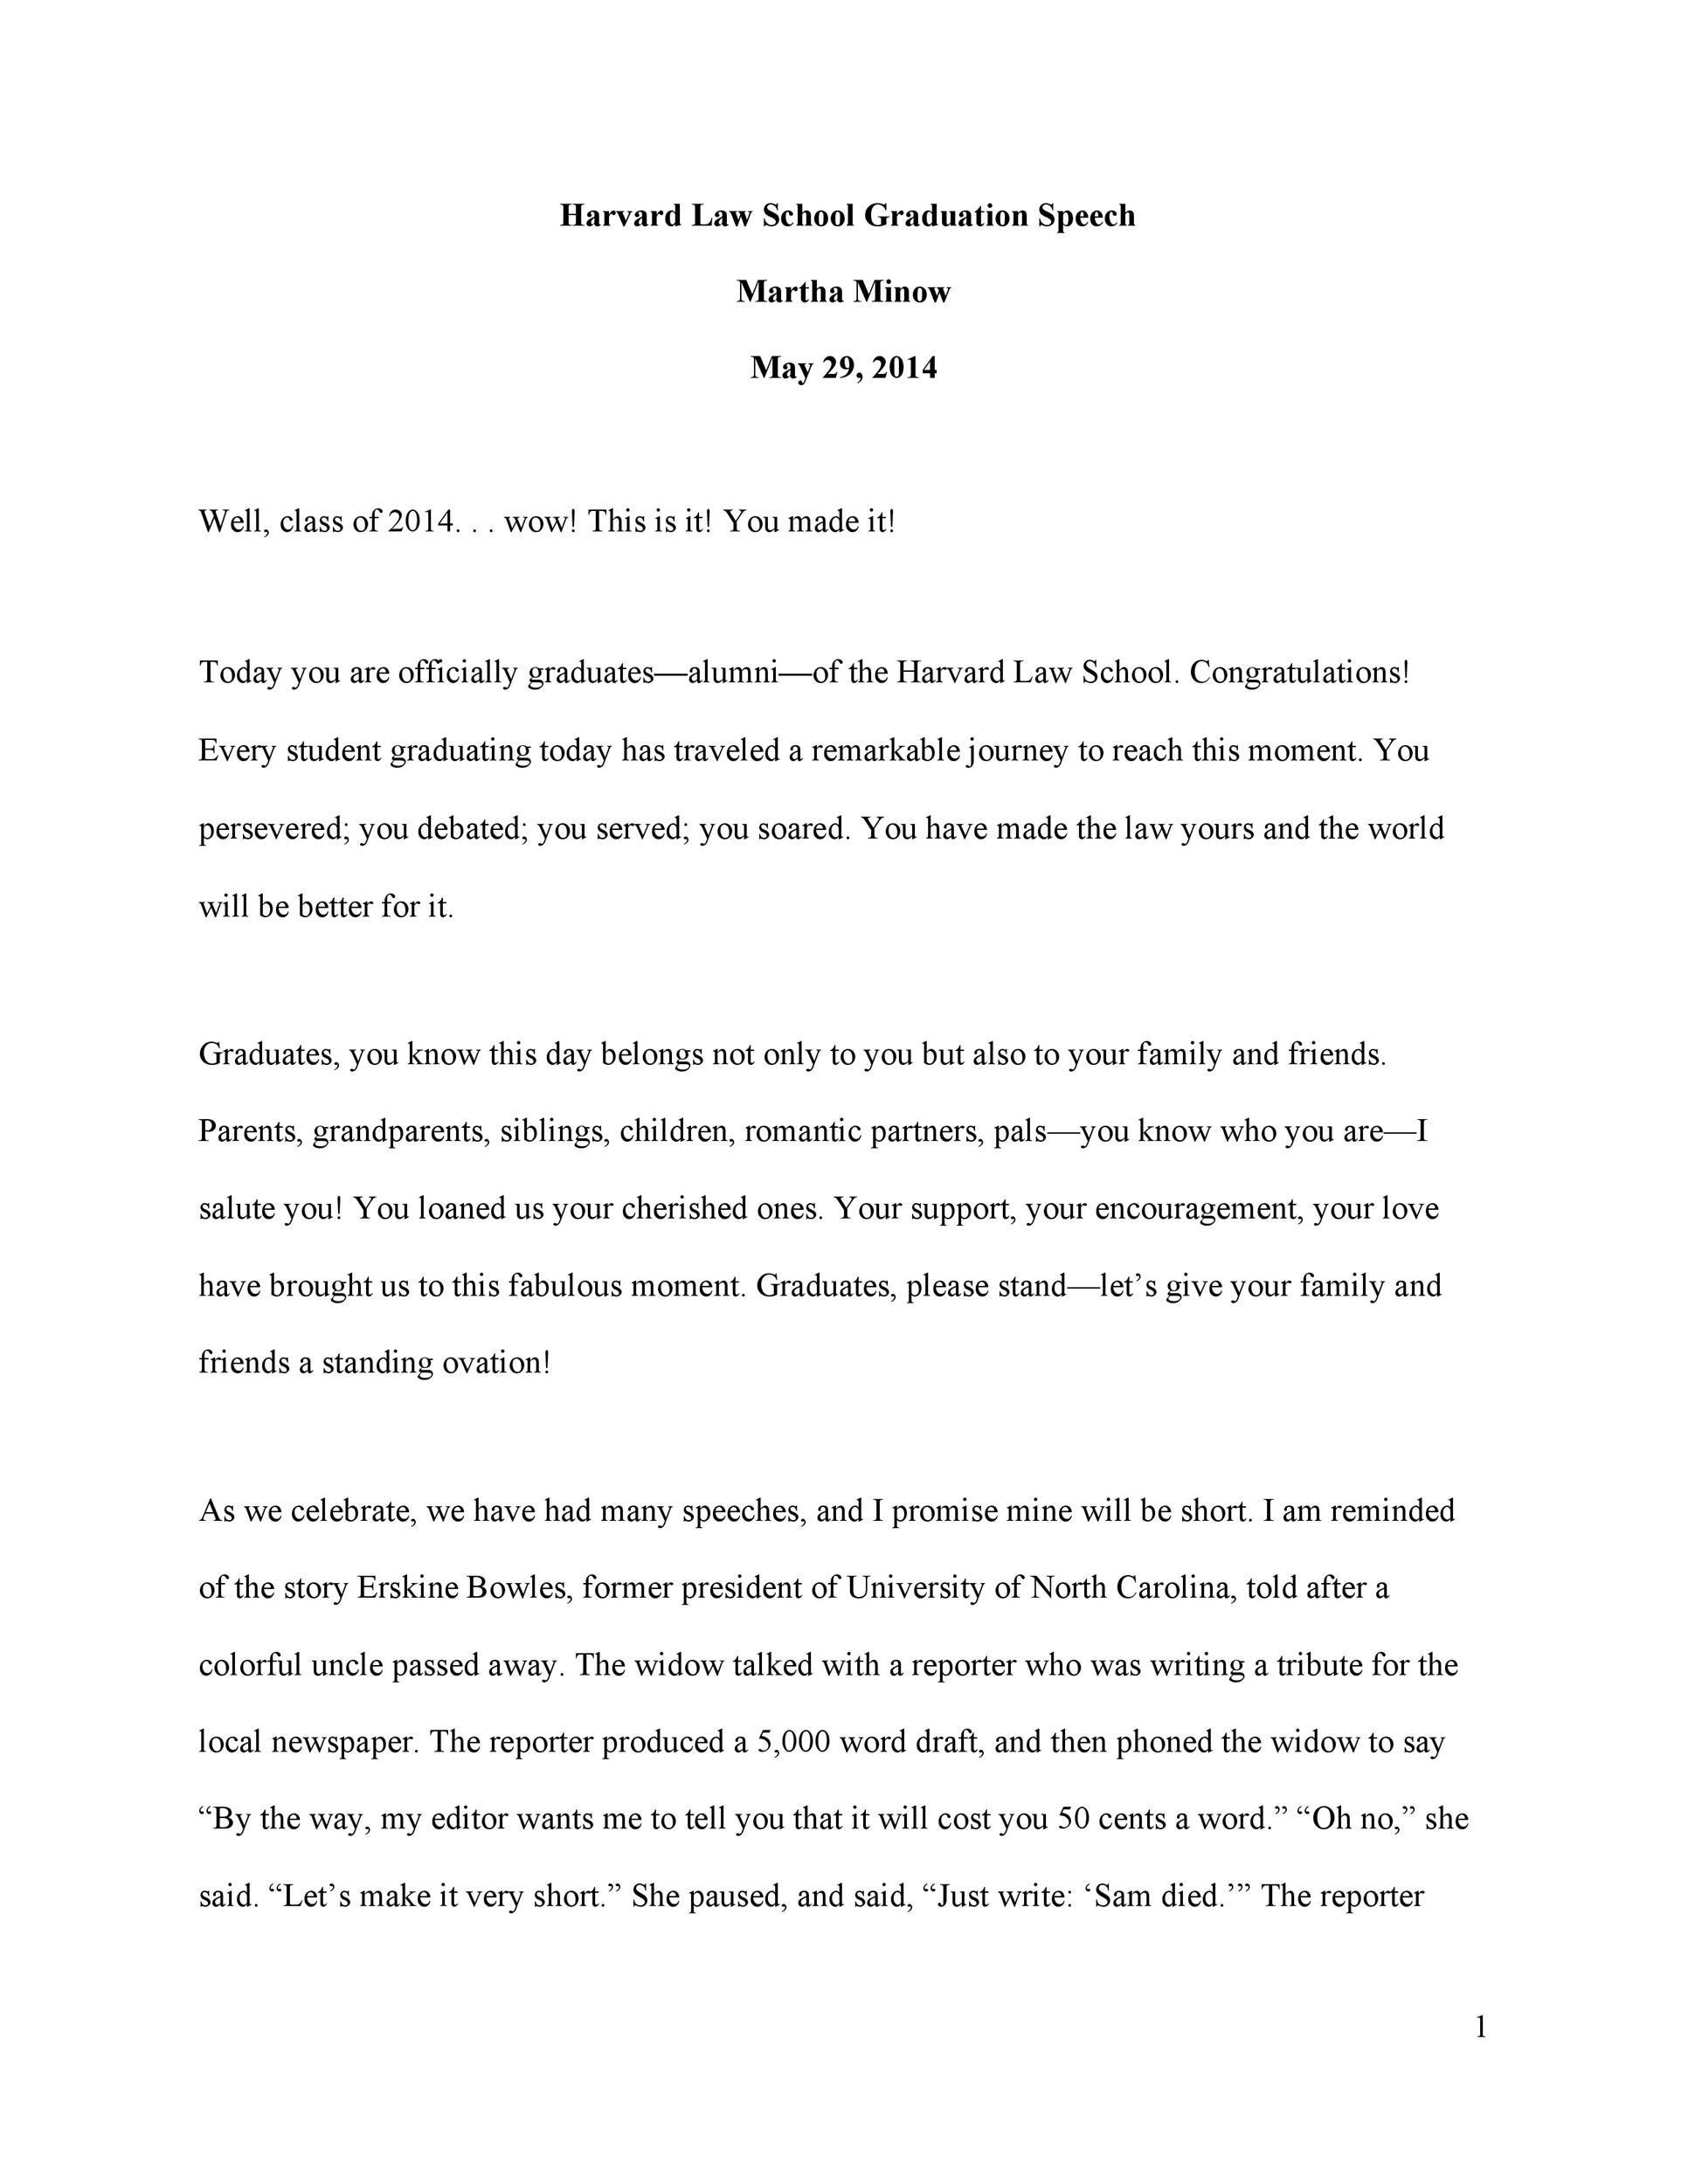 Free graduation speech example 50